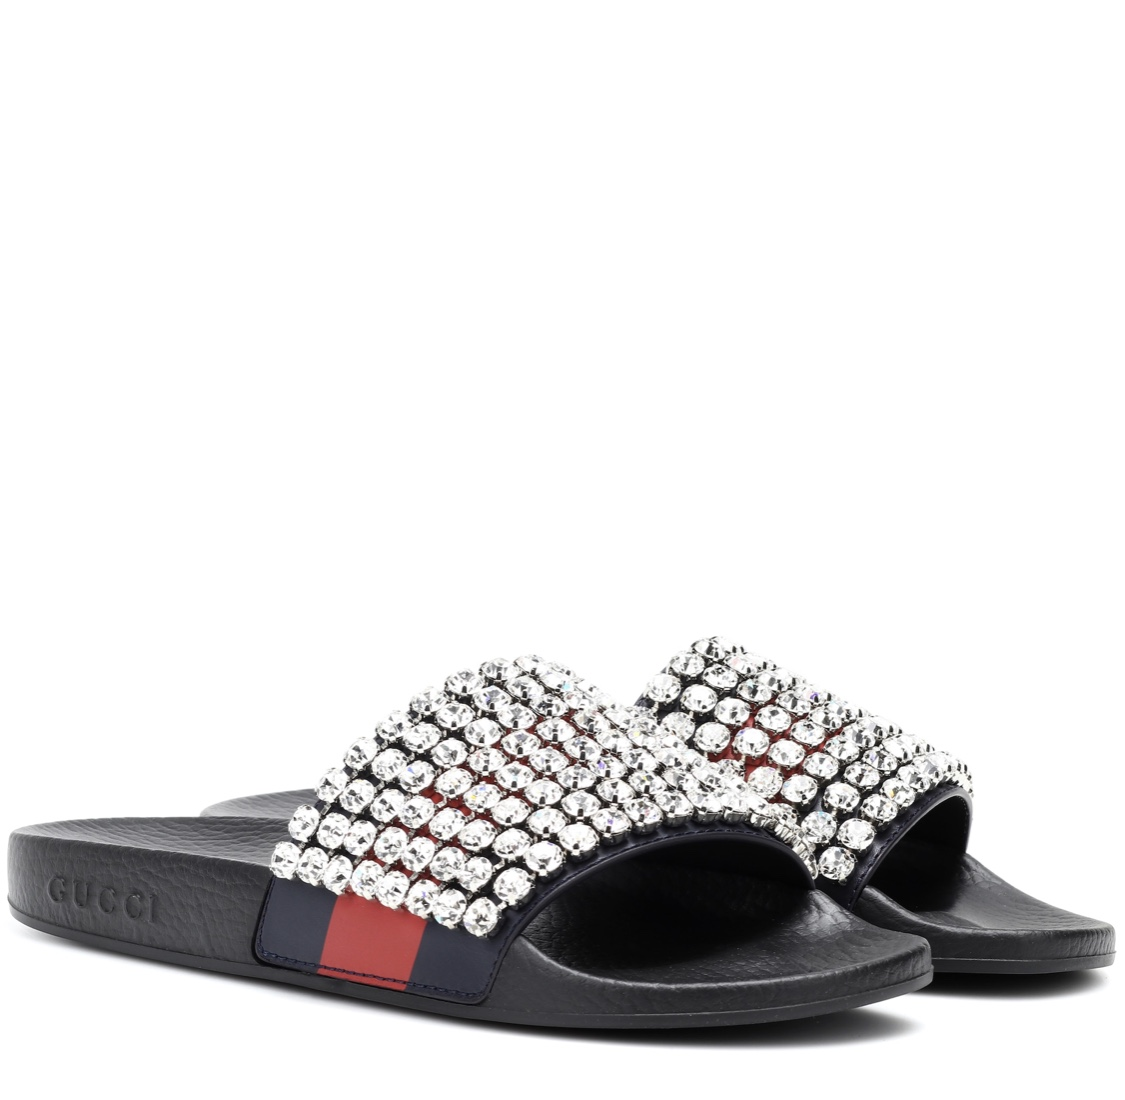 Ema sparkly Gucci slides - Nifemi Couture